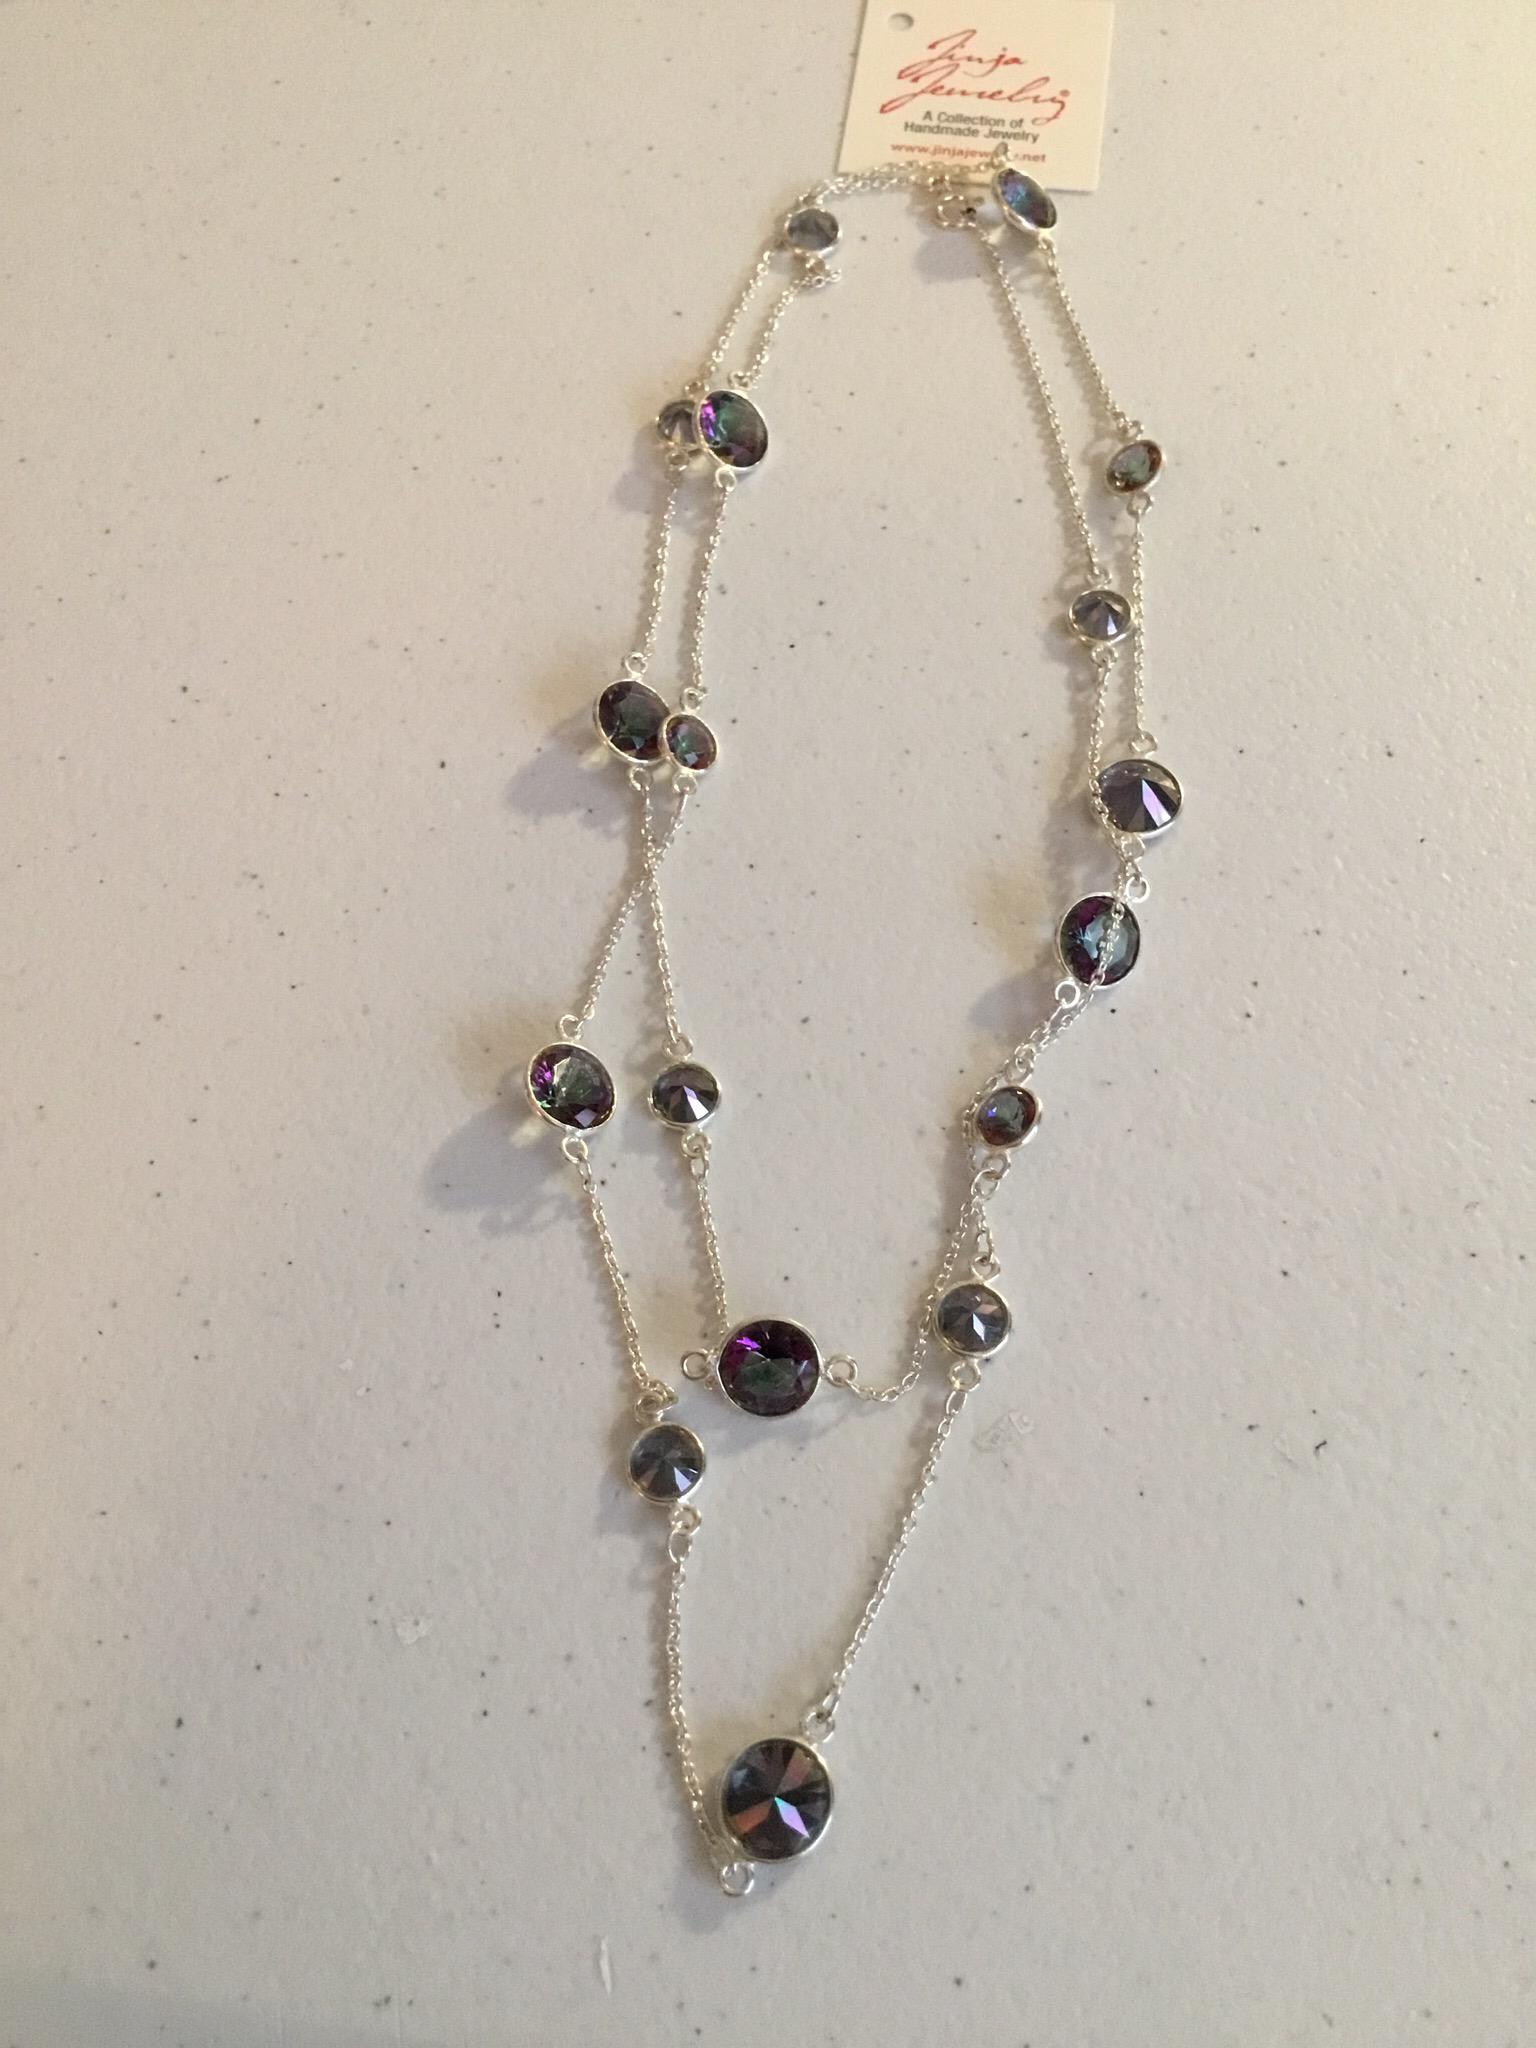 Sterling Silver Handmade Mystic Topaz Necklace AKL-791